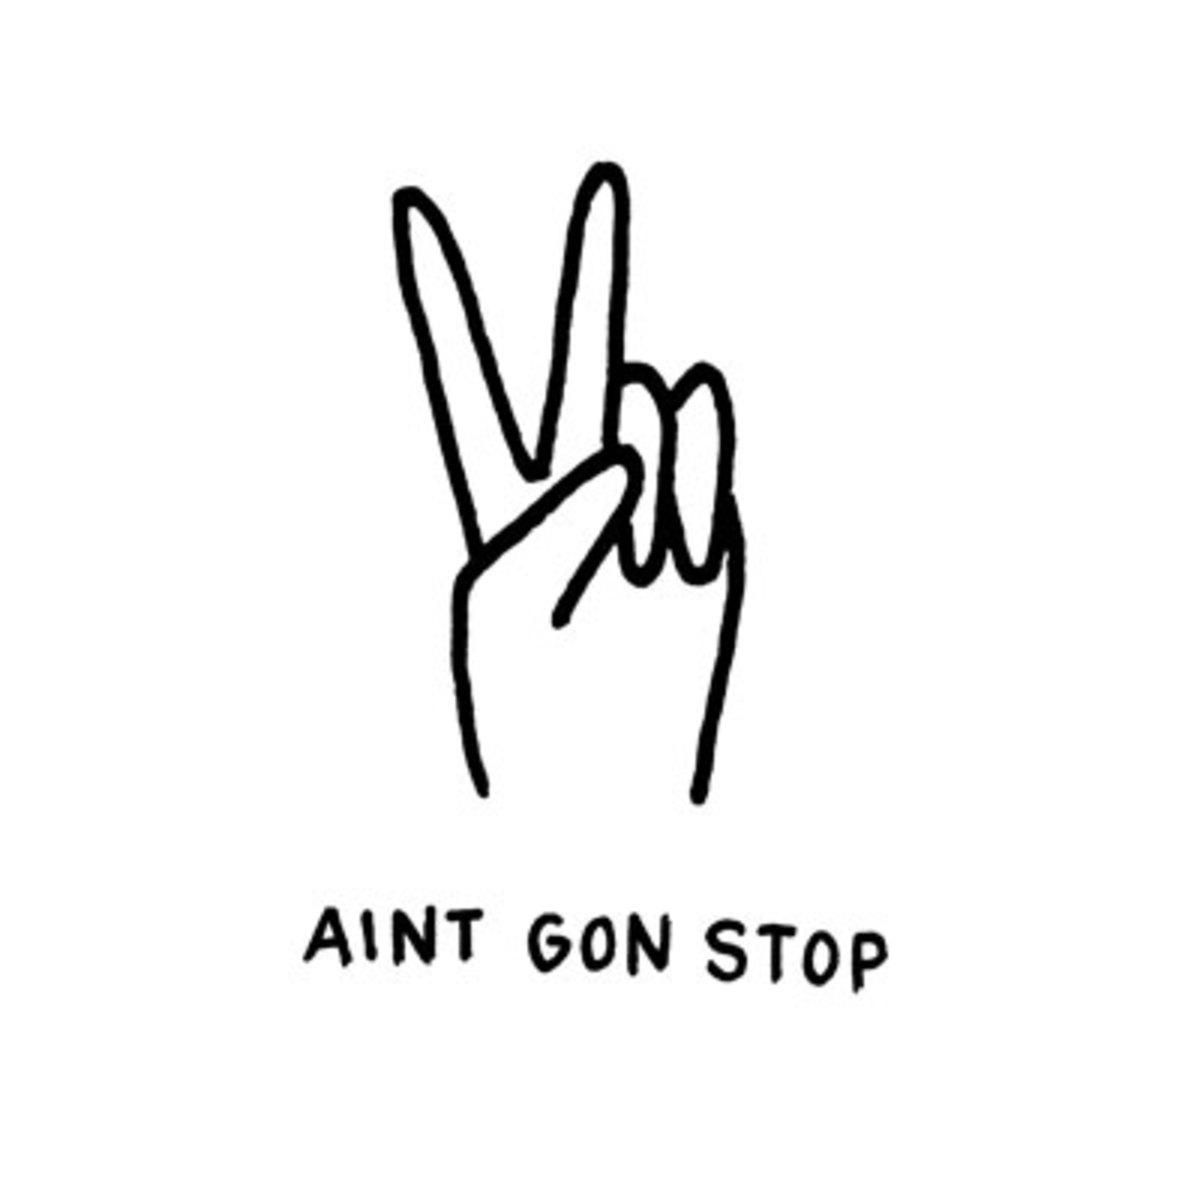 sol-aint-gon-stop.jpg